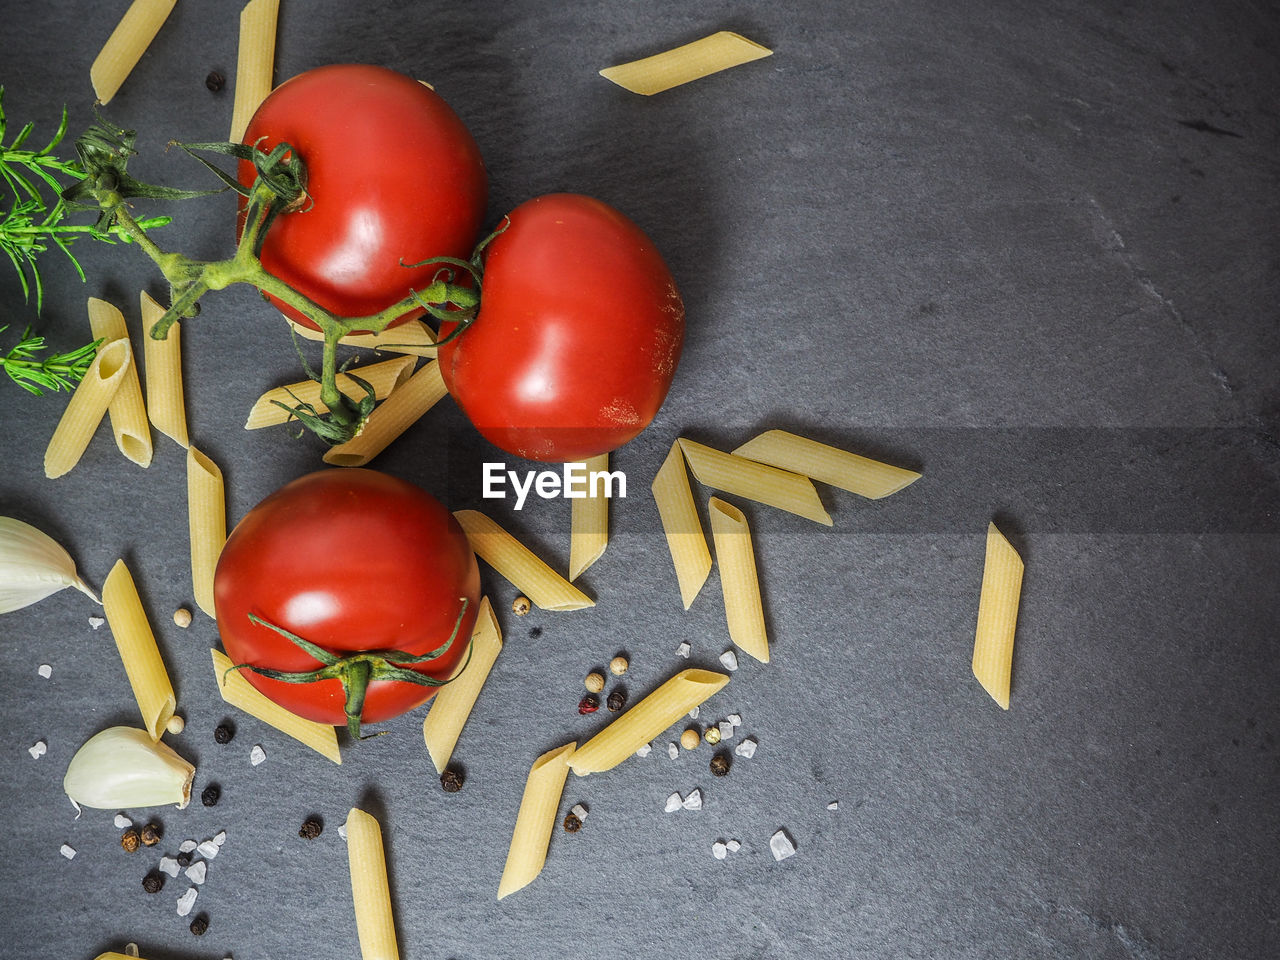 Ingredients for pasta preparation